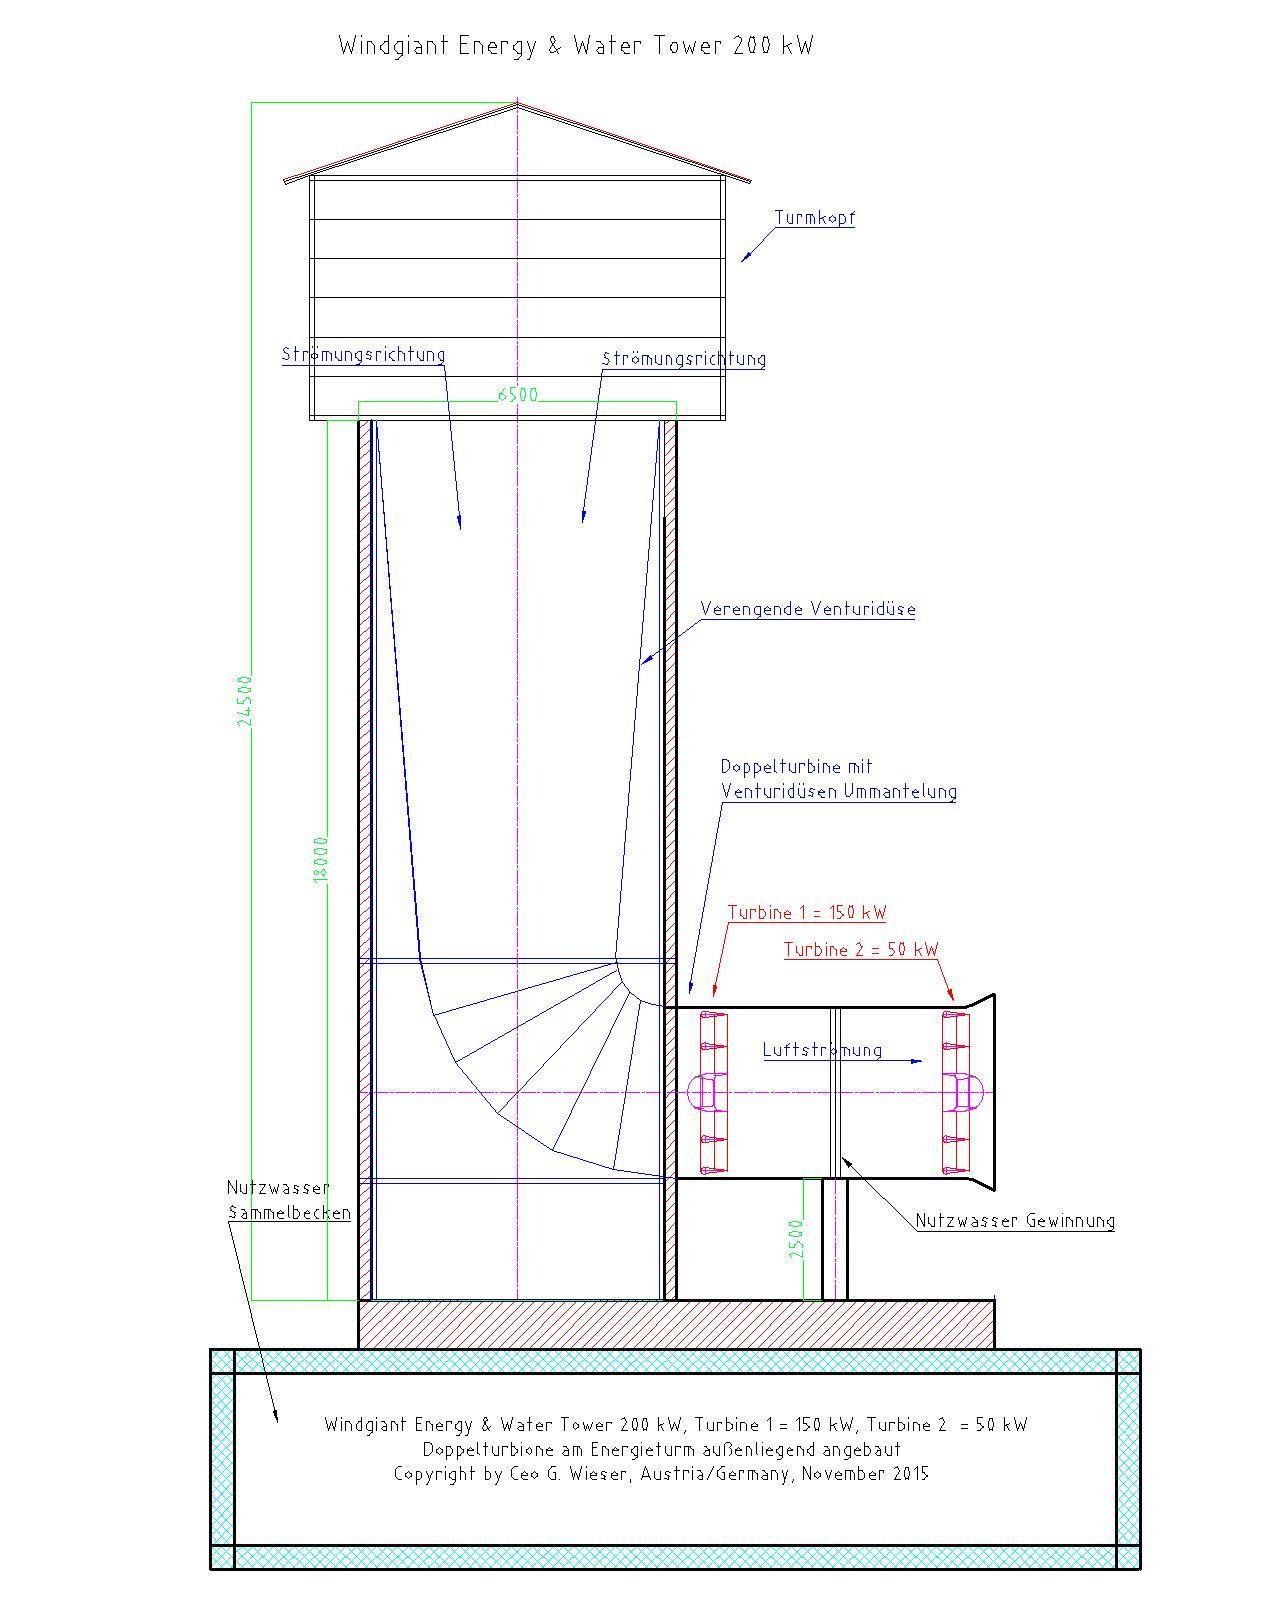 Energieturm-200_kW-_23.Nov.2015